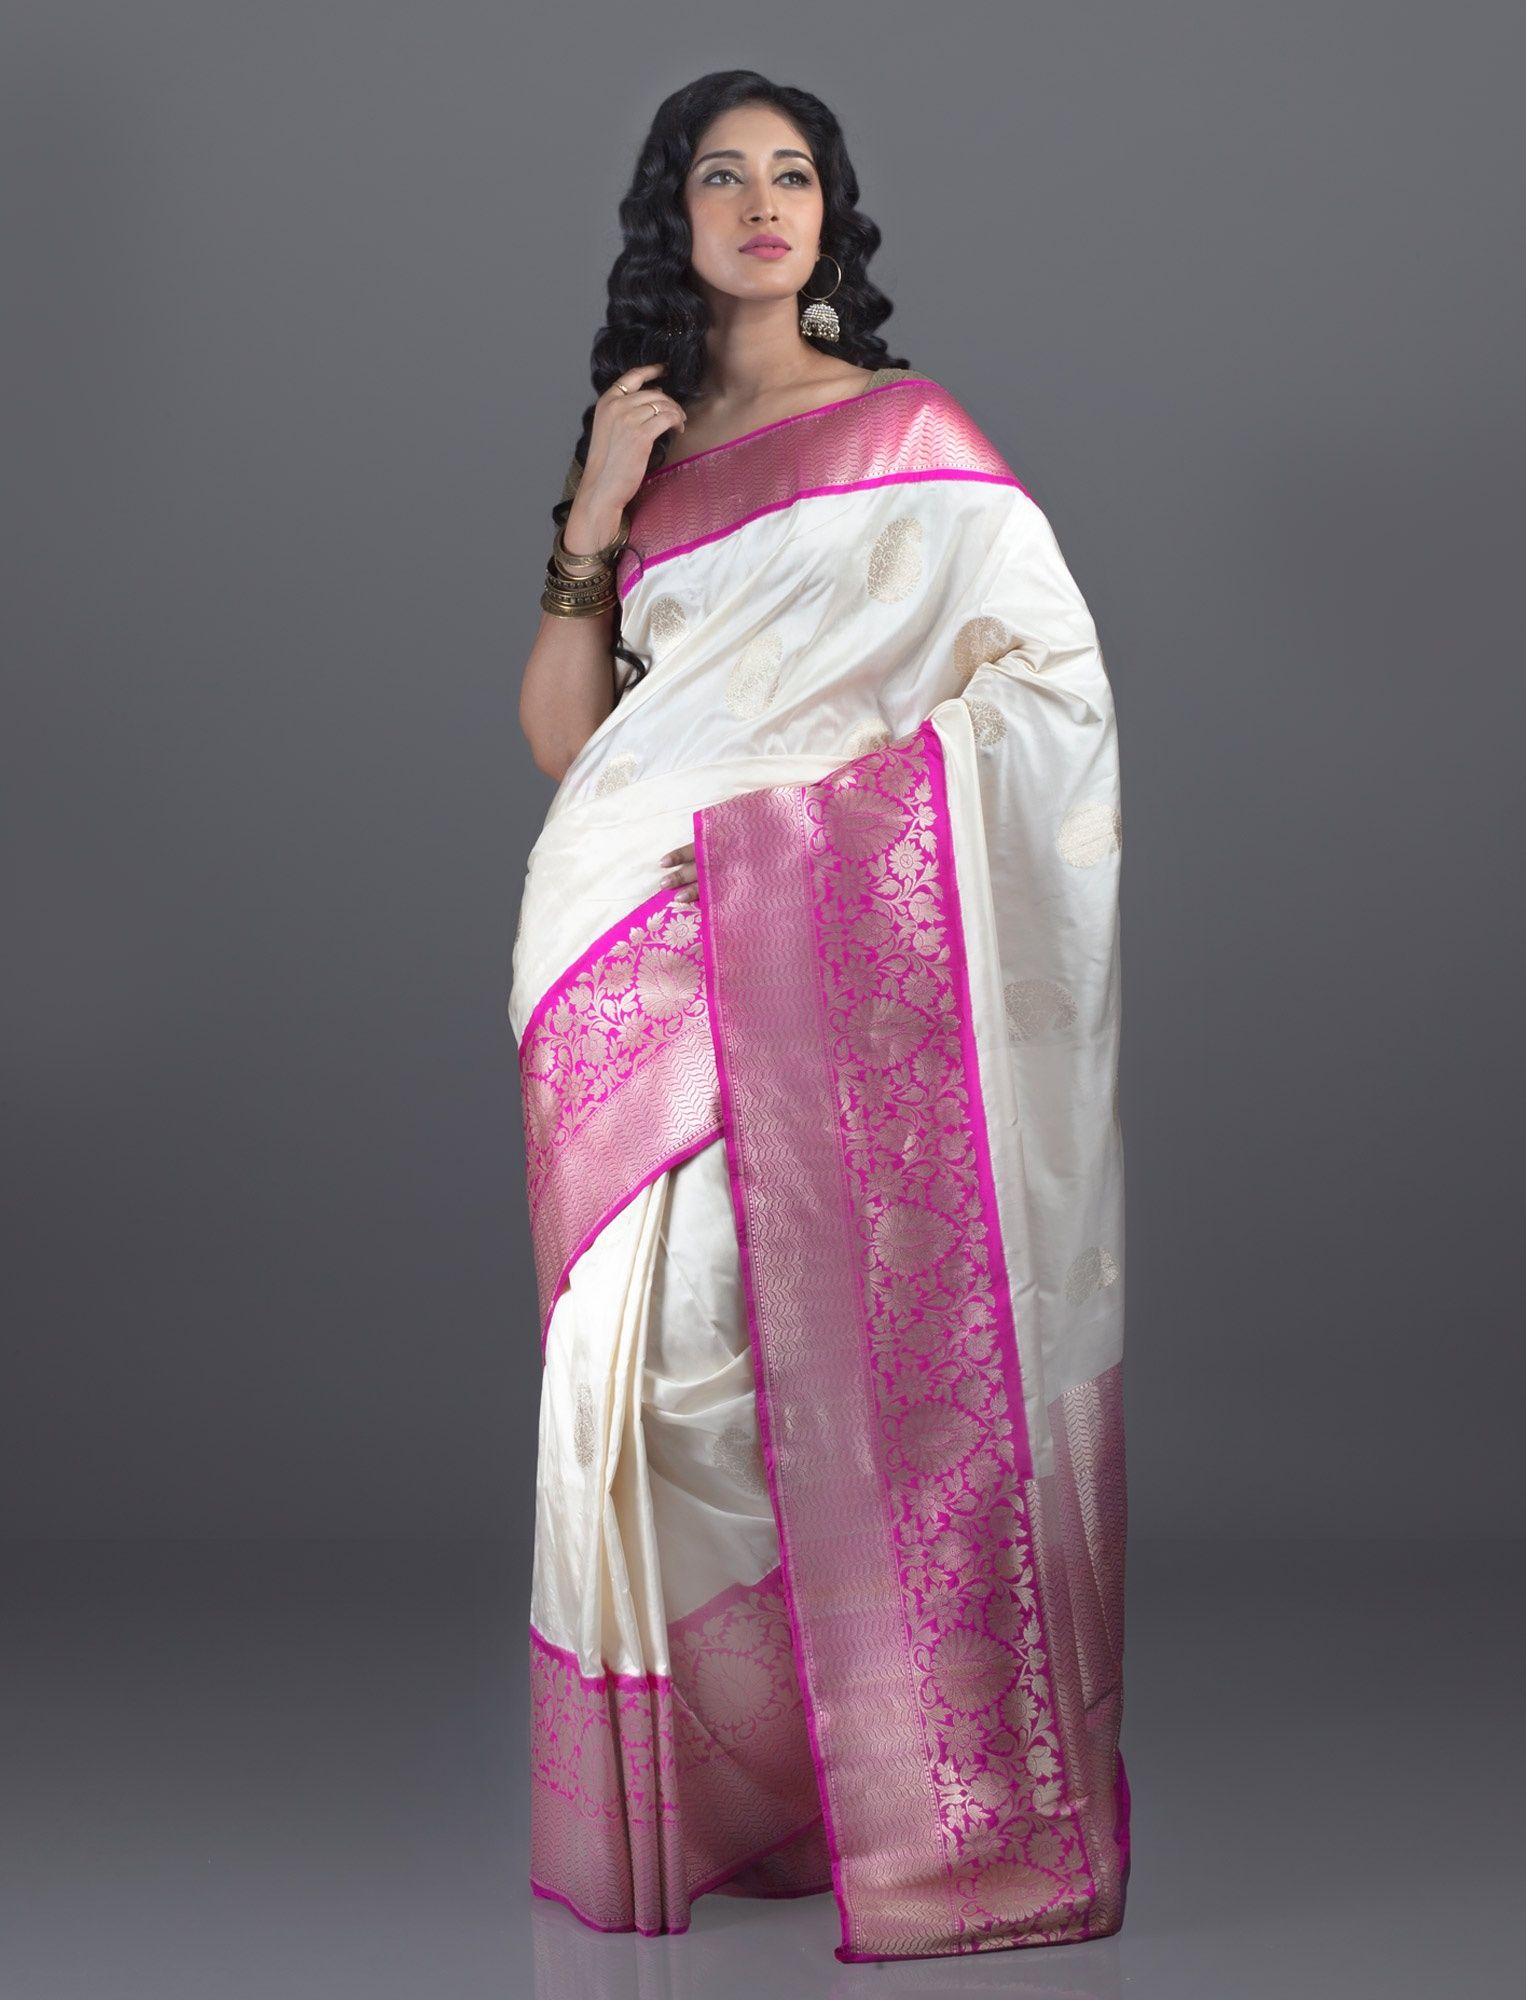 58f8df61233193 Half White Banarasi Katan Saree with Pink Border | Six yards of ...